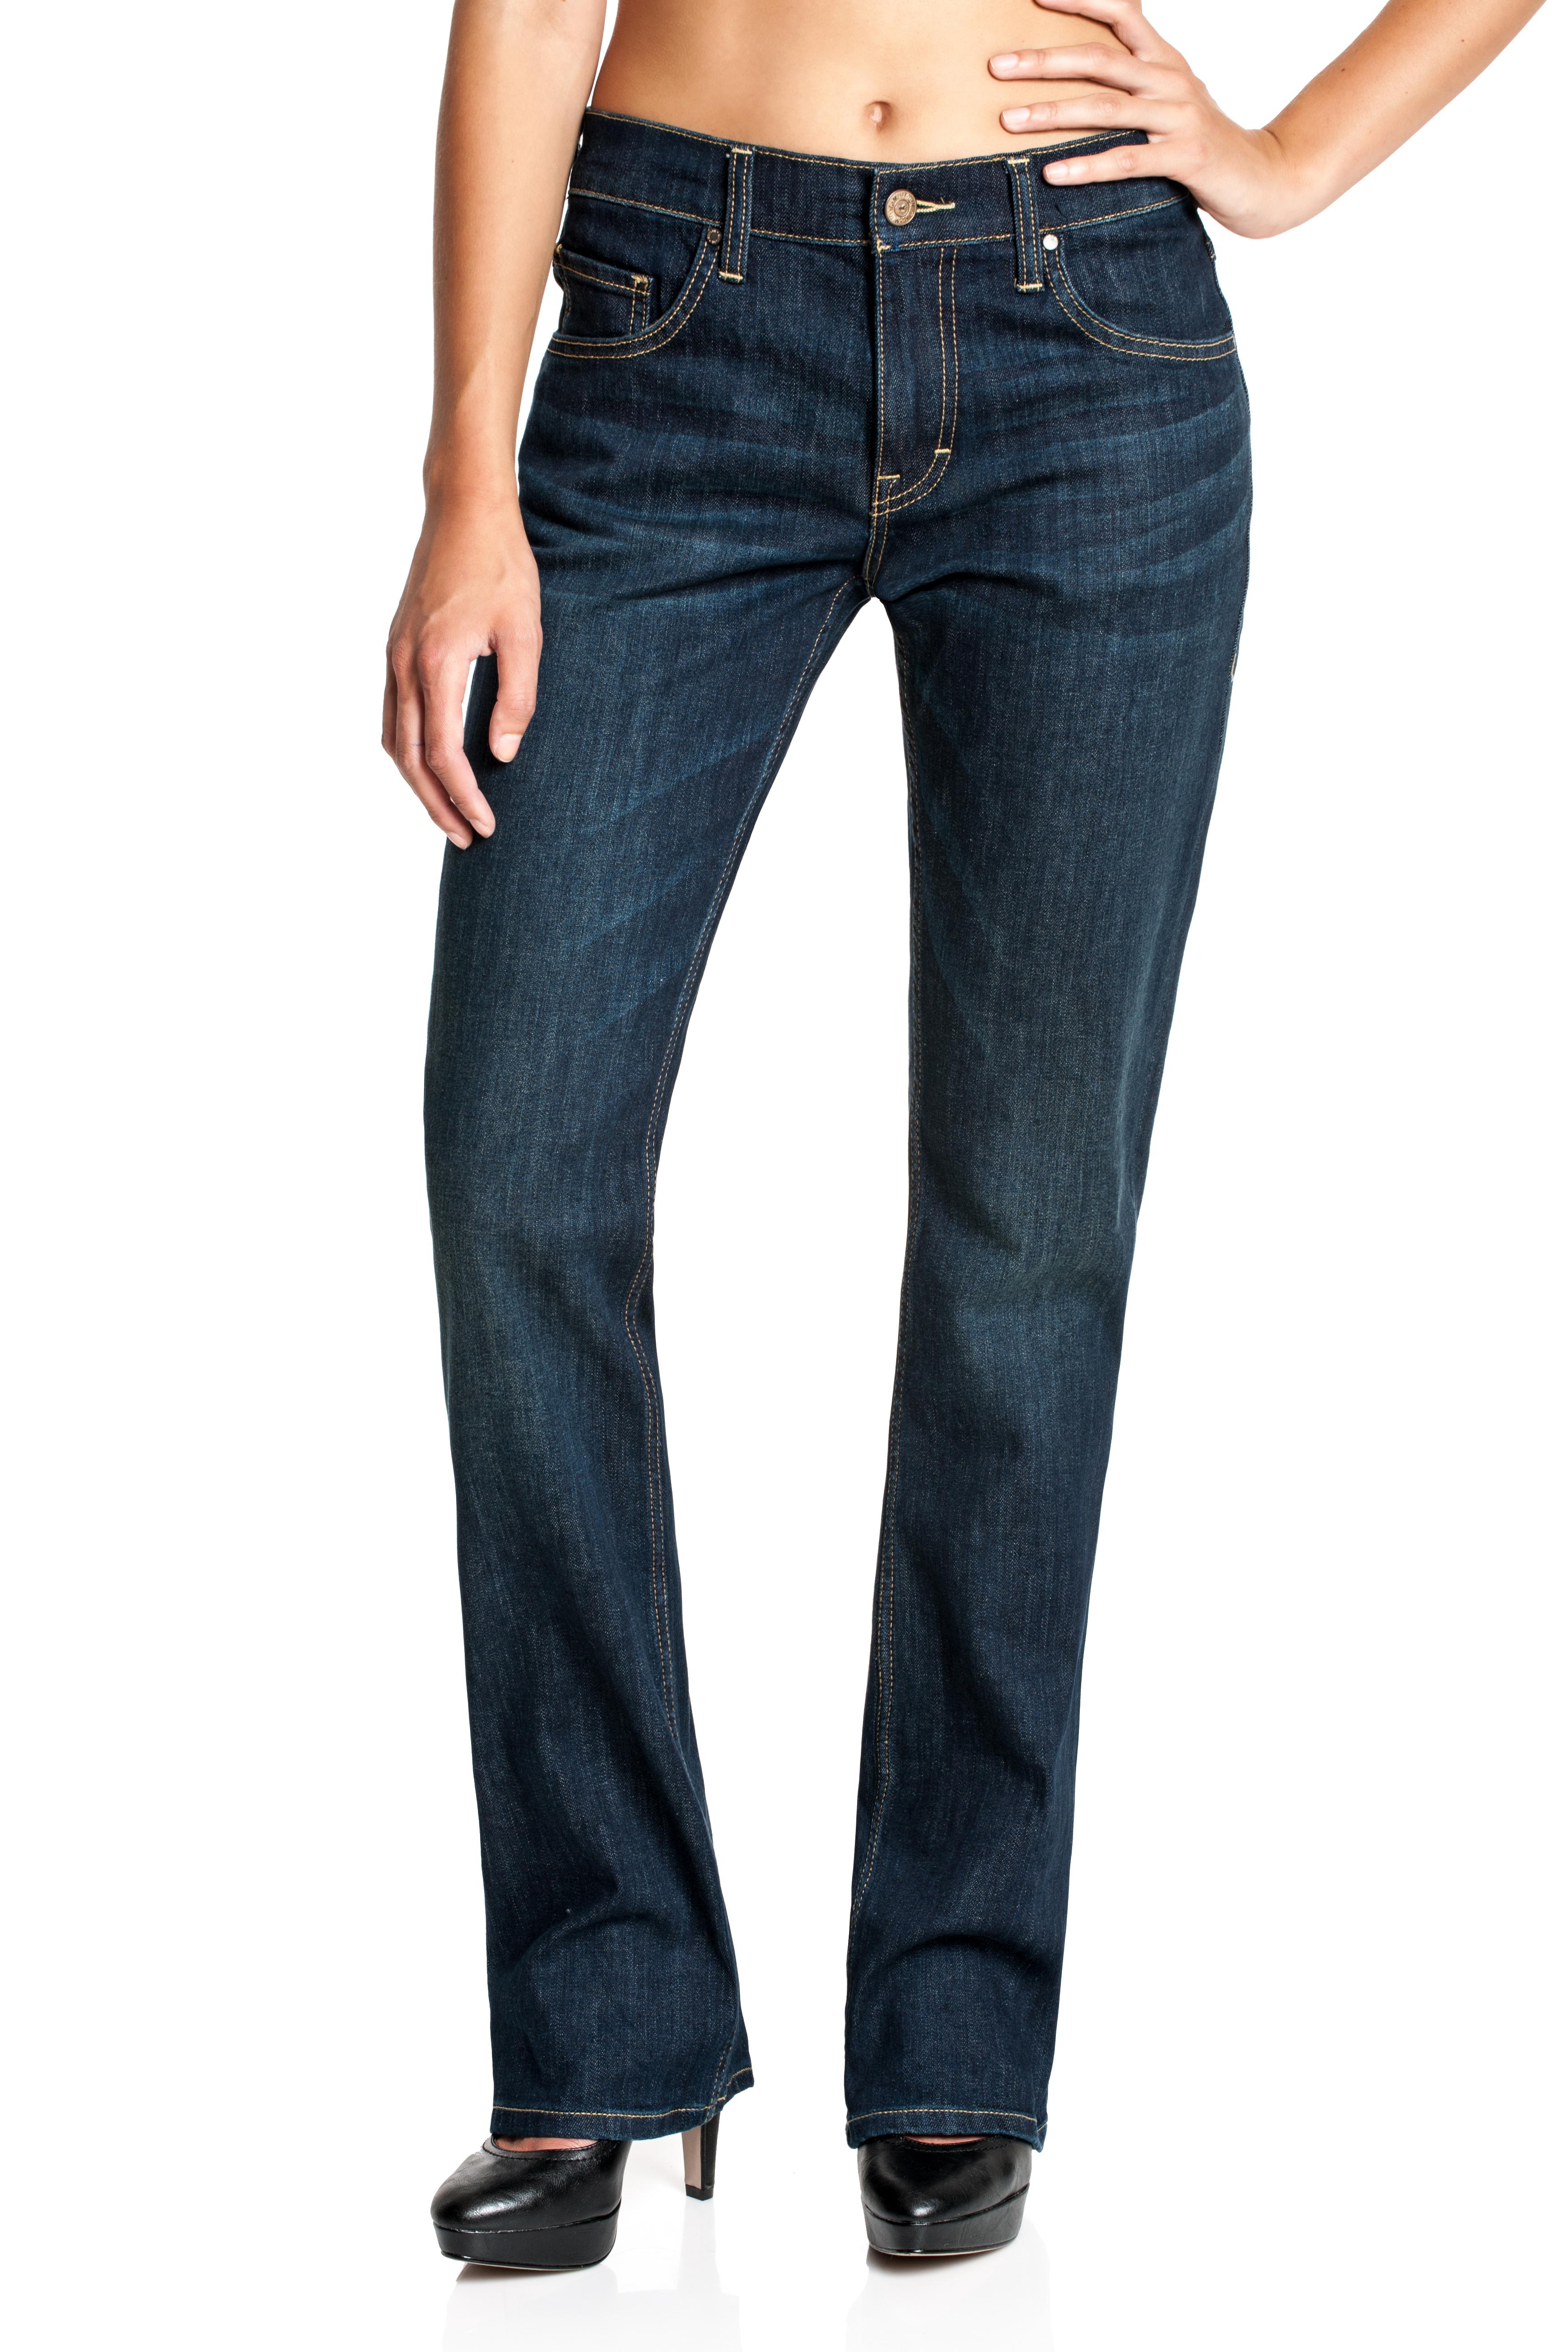 Mustang Jeans Sissy